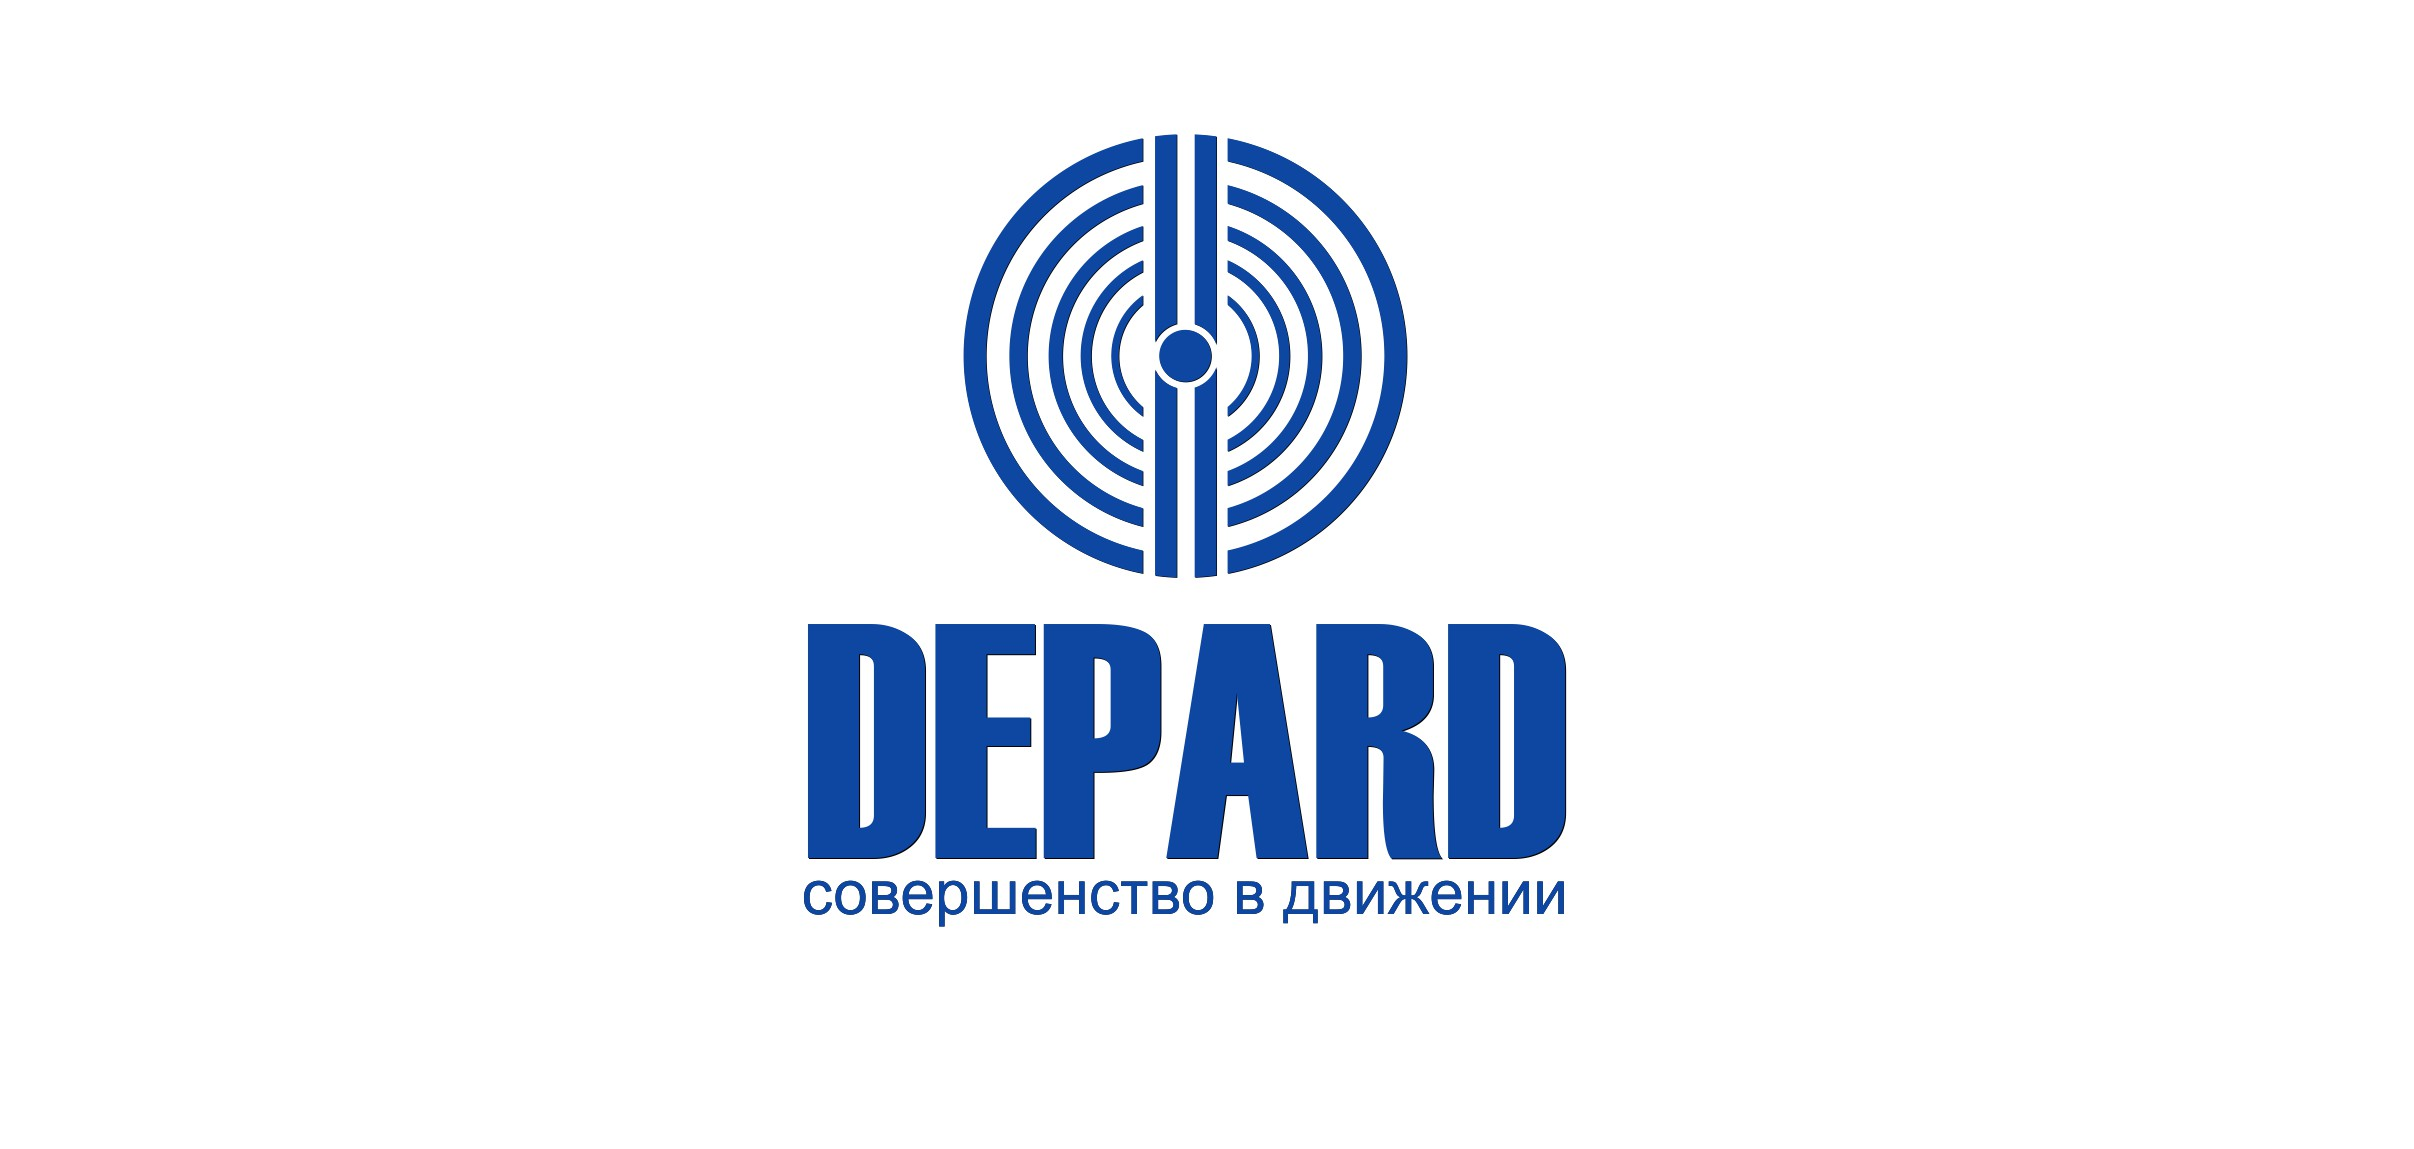 Логотип для компании (услуги недвижимость) фото f_243592fa5c266baa.jpg